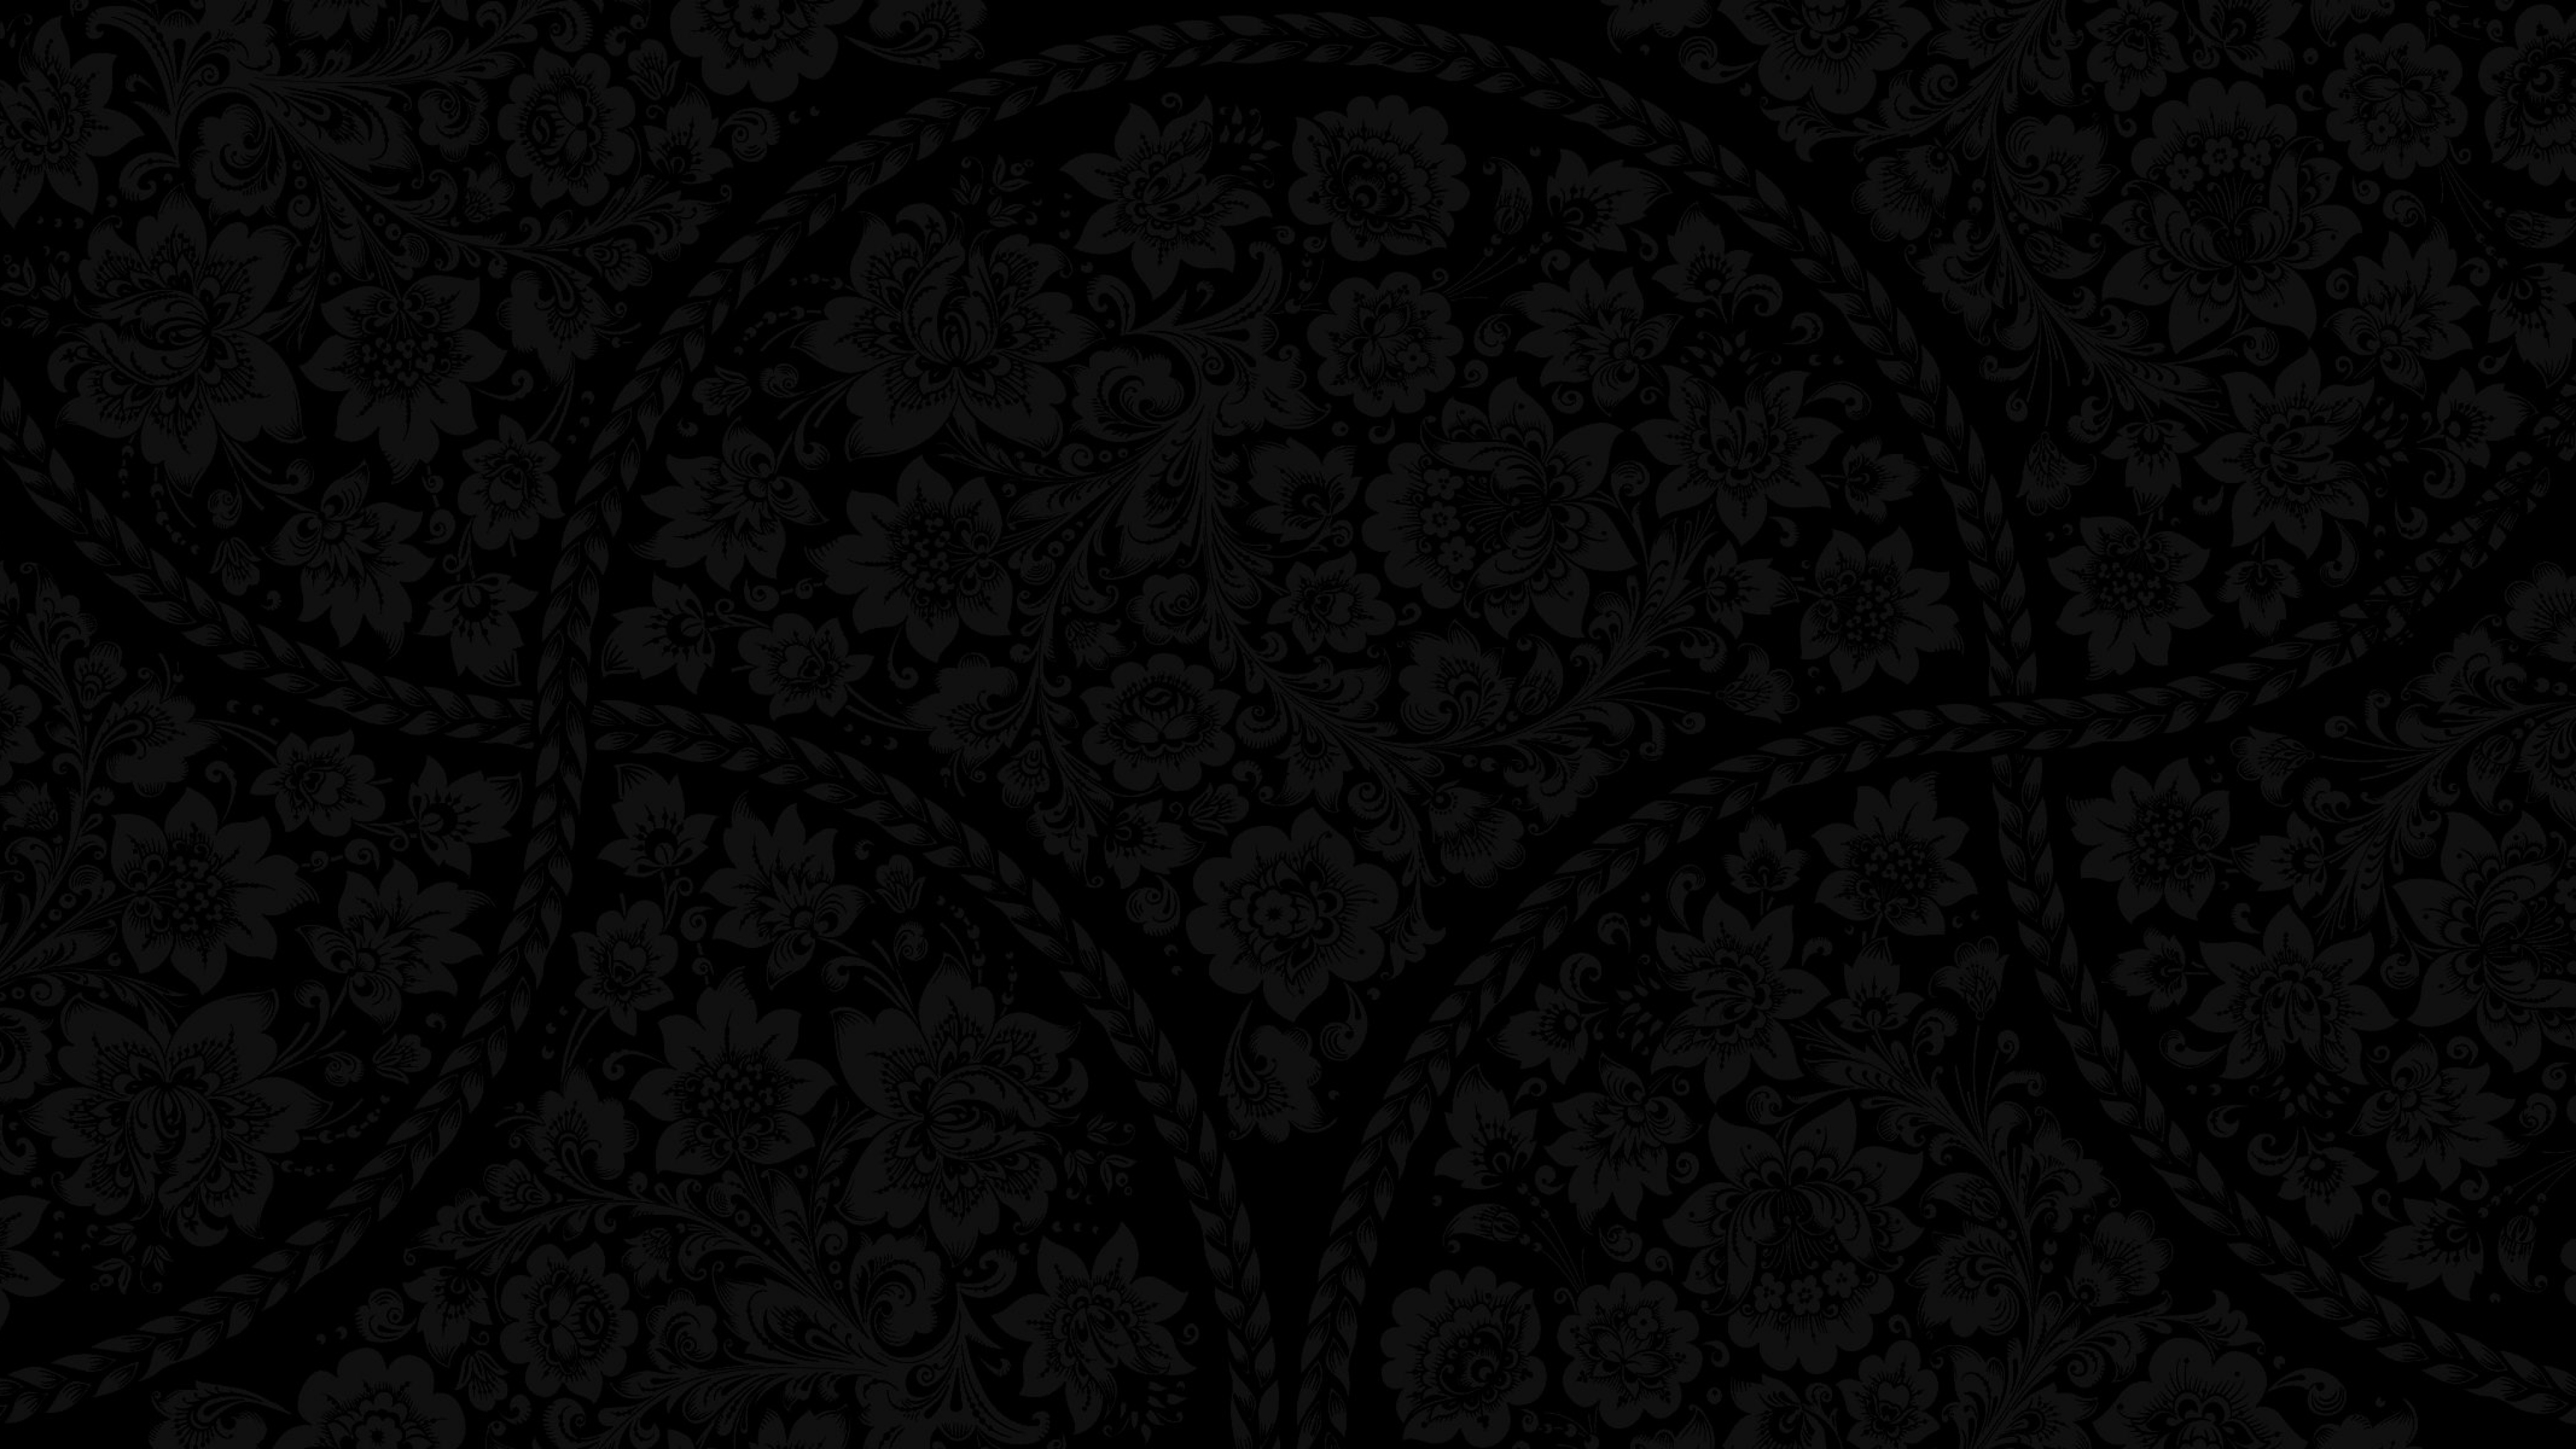 Wallpaper 3840x2160 color pattern texture background dark 4K 3840x2160